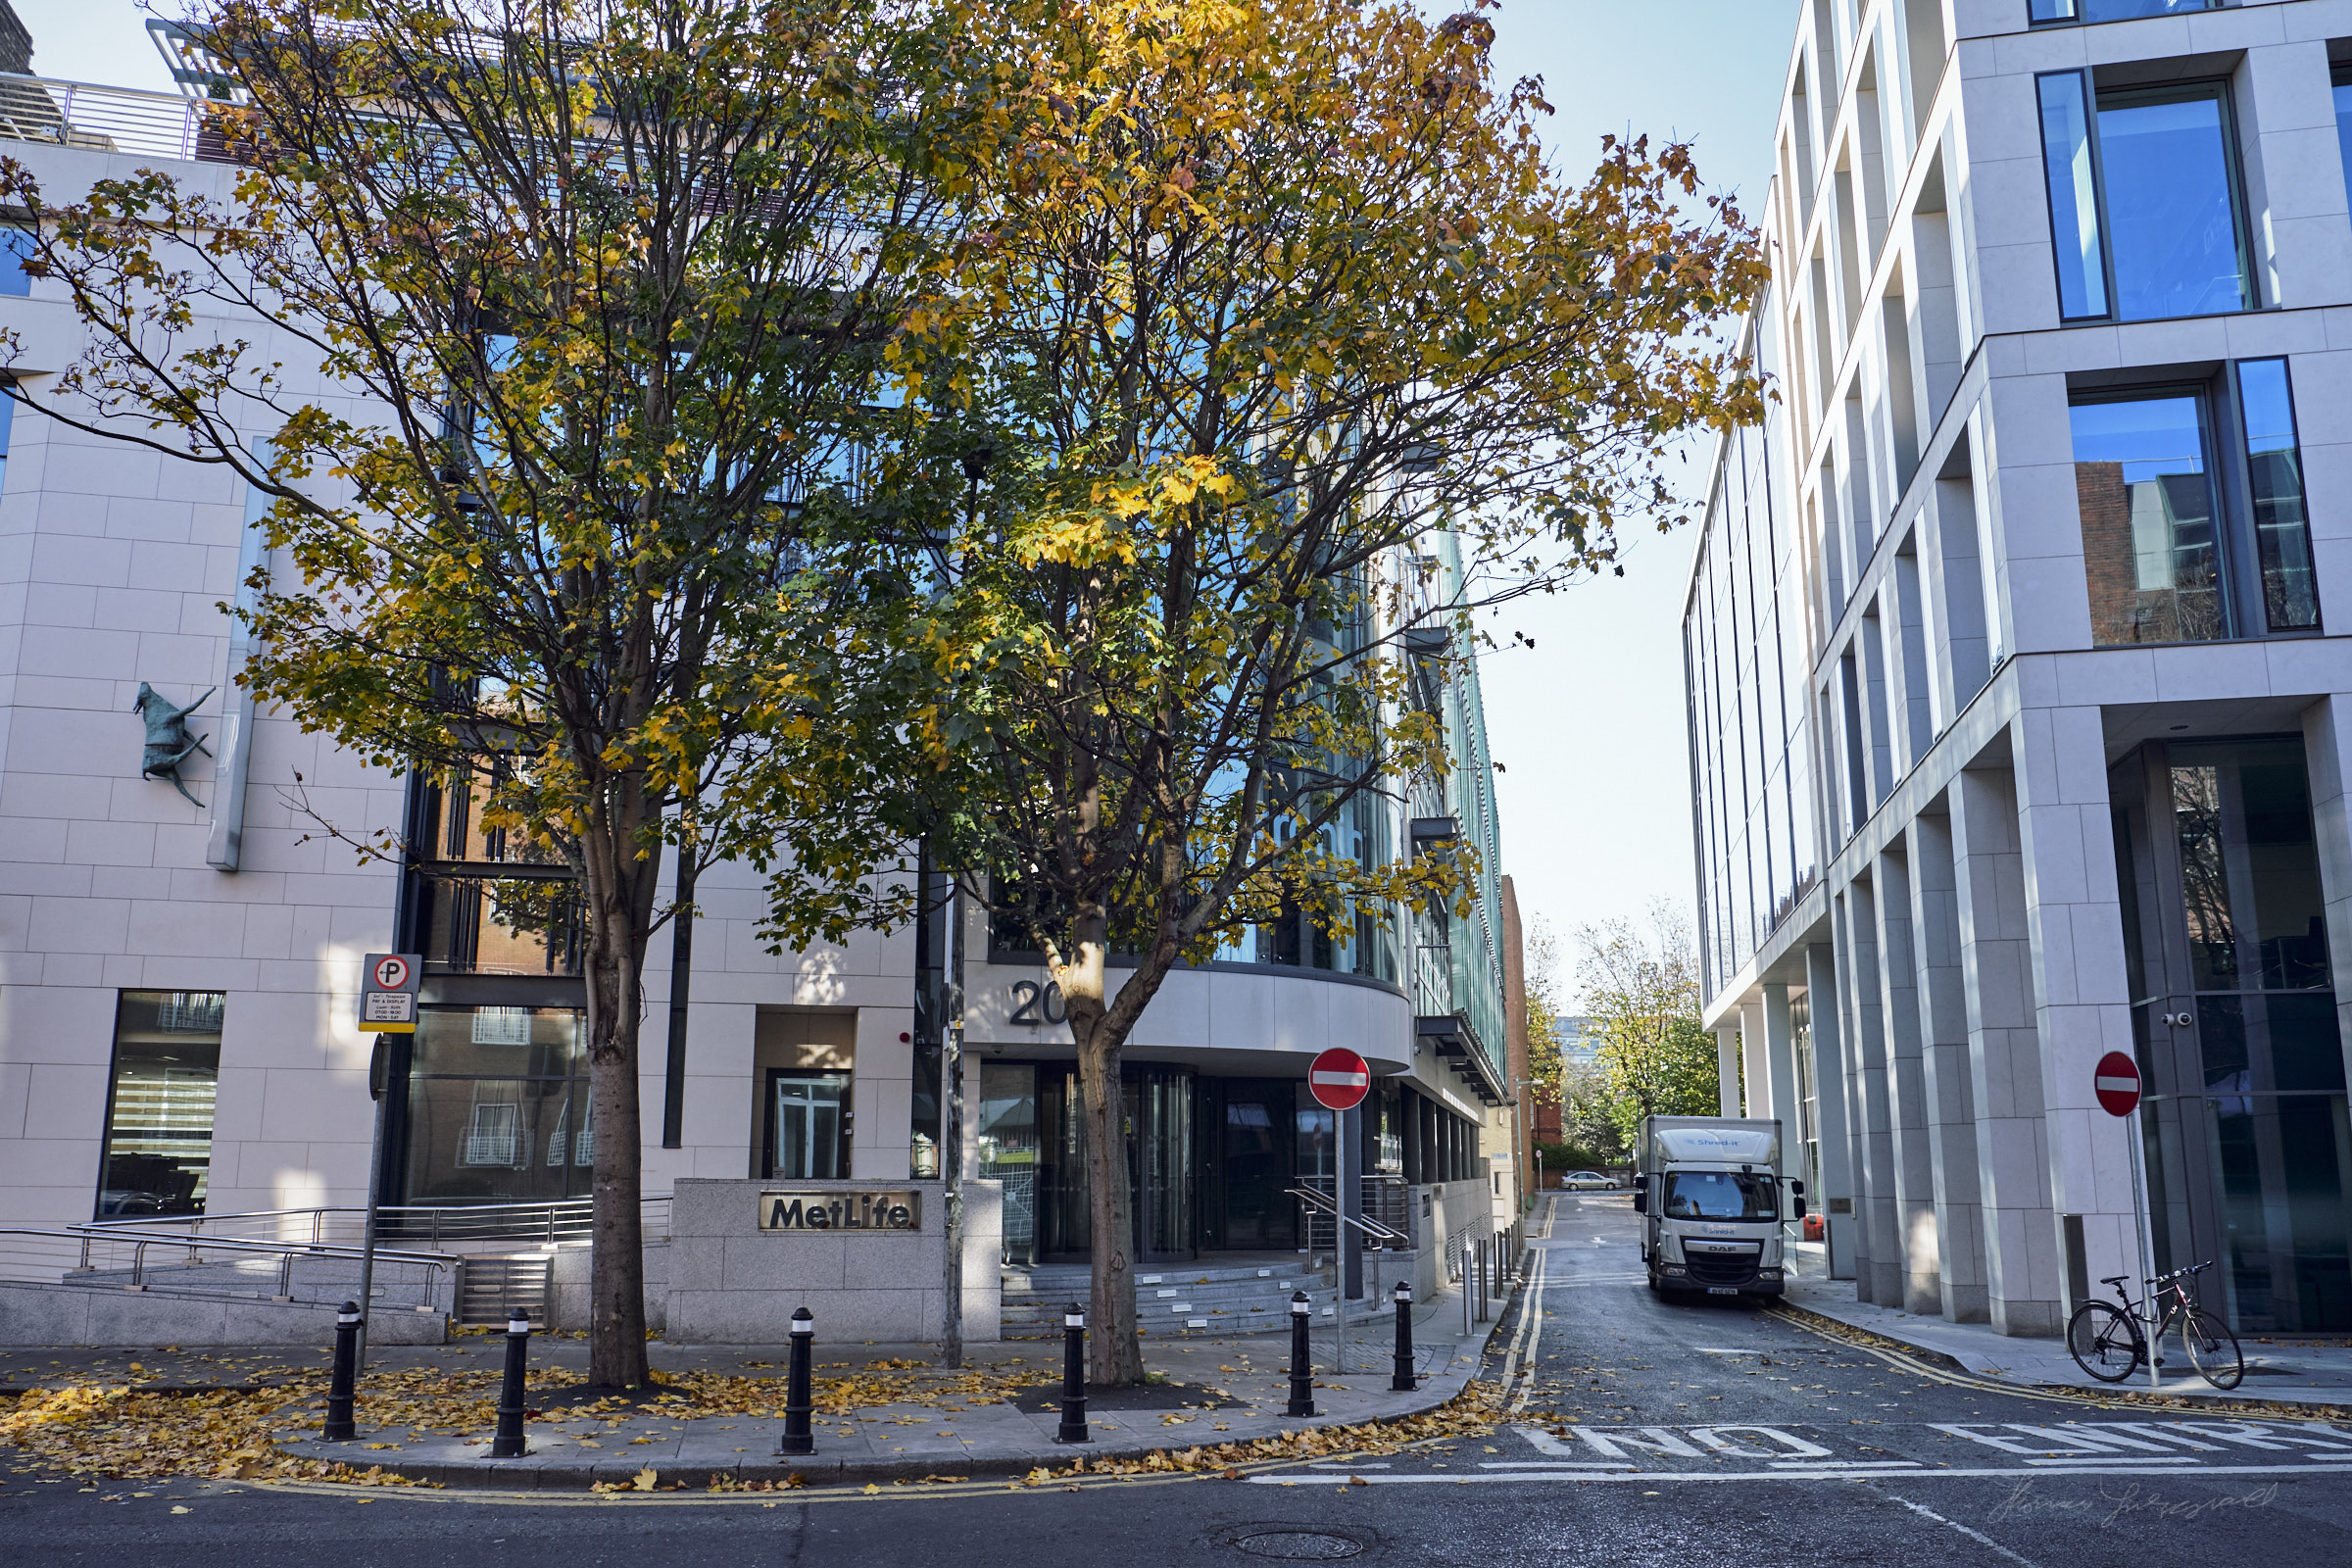 Autumn Leaves and Autumn Sunshine in Dublin City